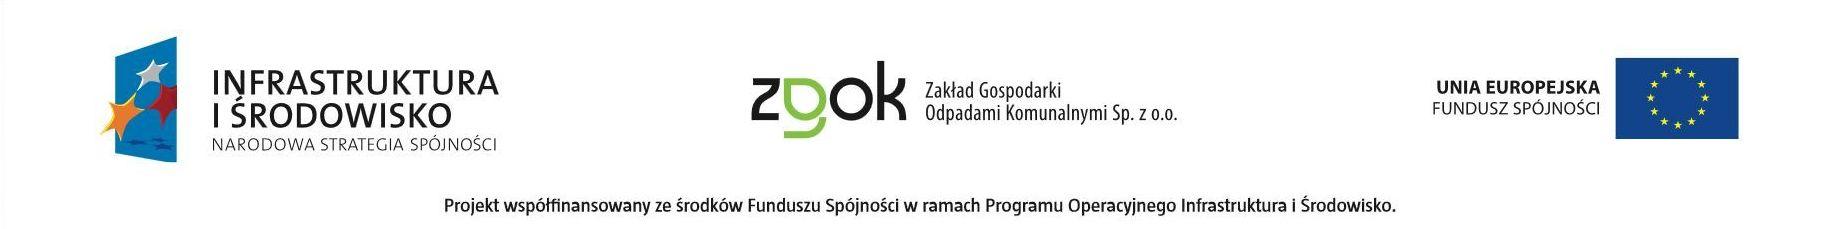 http://m.wm.pl/2015/04/orig/logo-243642.jpg